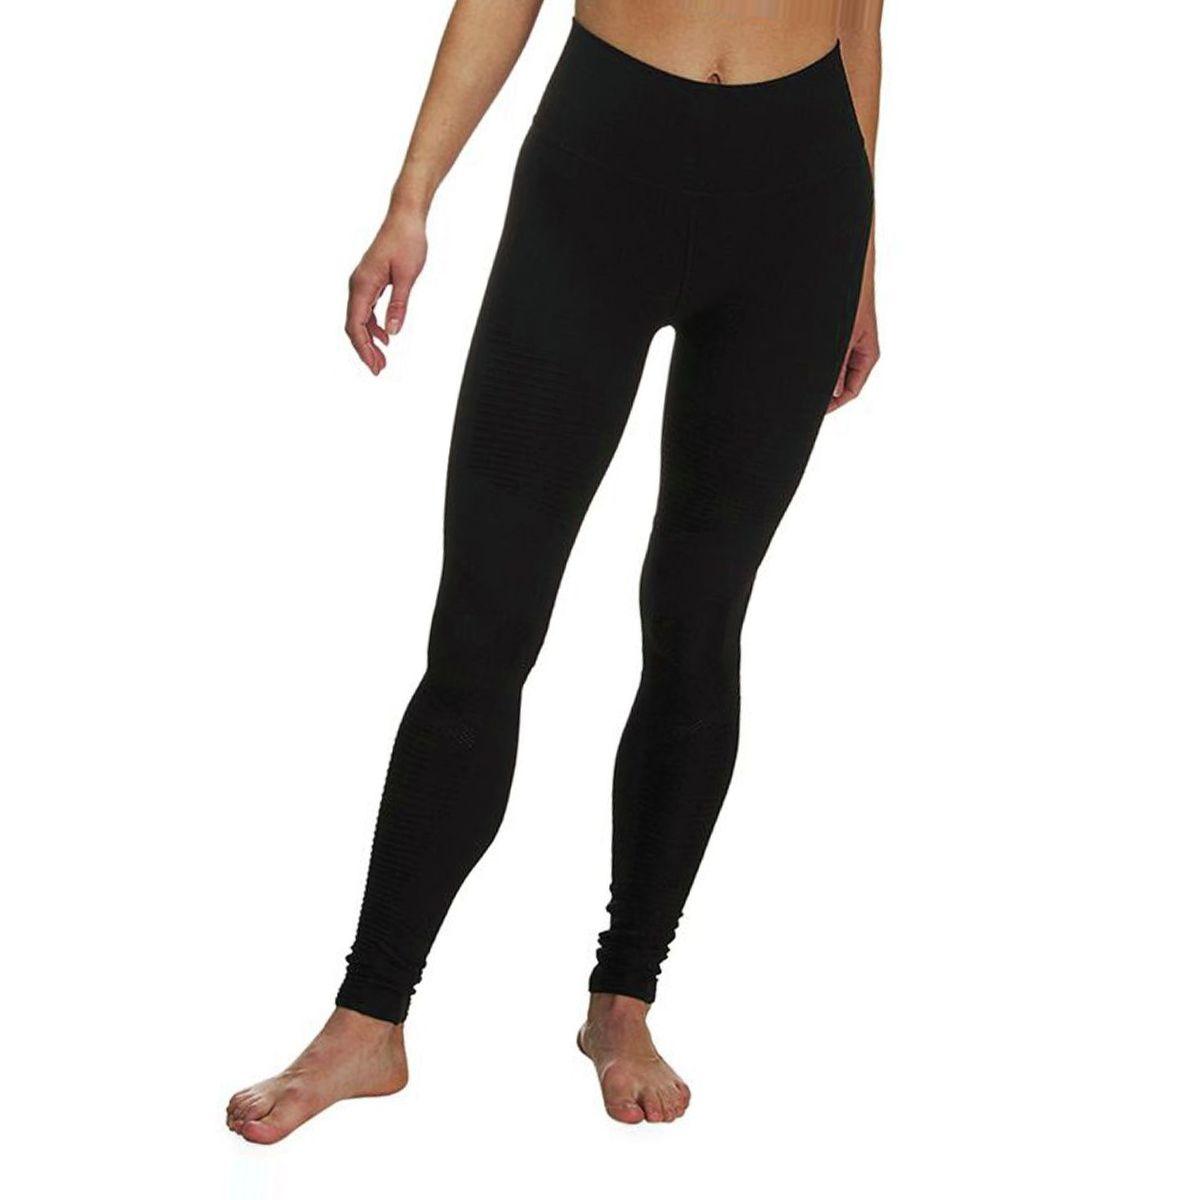 Alo Yoga High-Waist Seamless Moto Legging - Women's